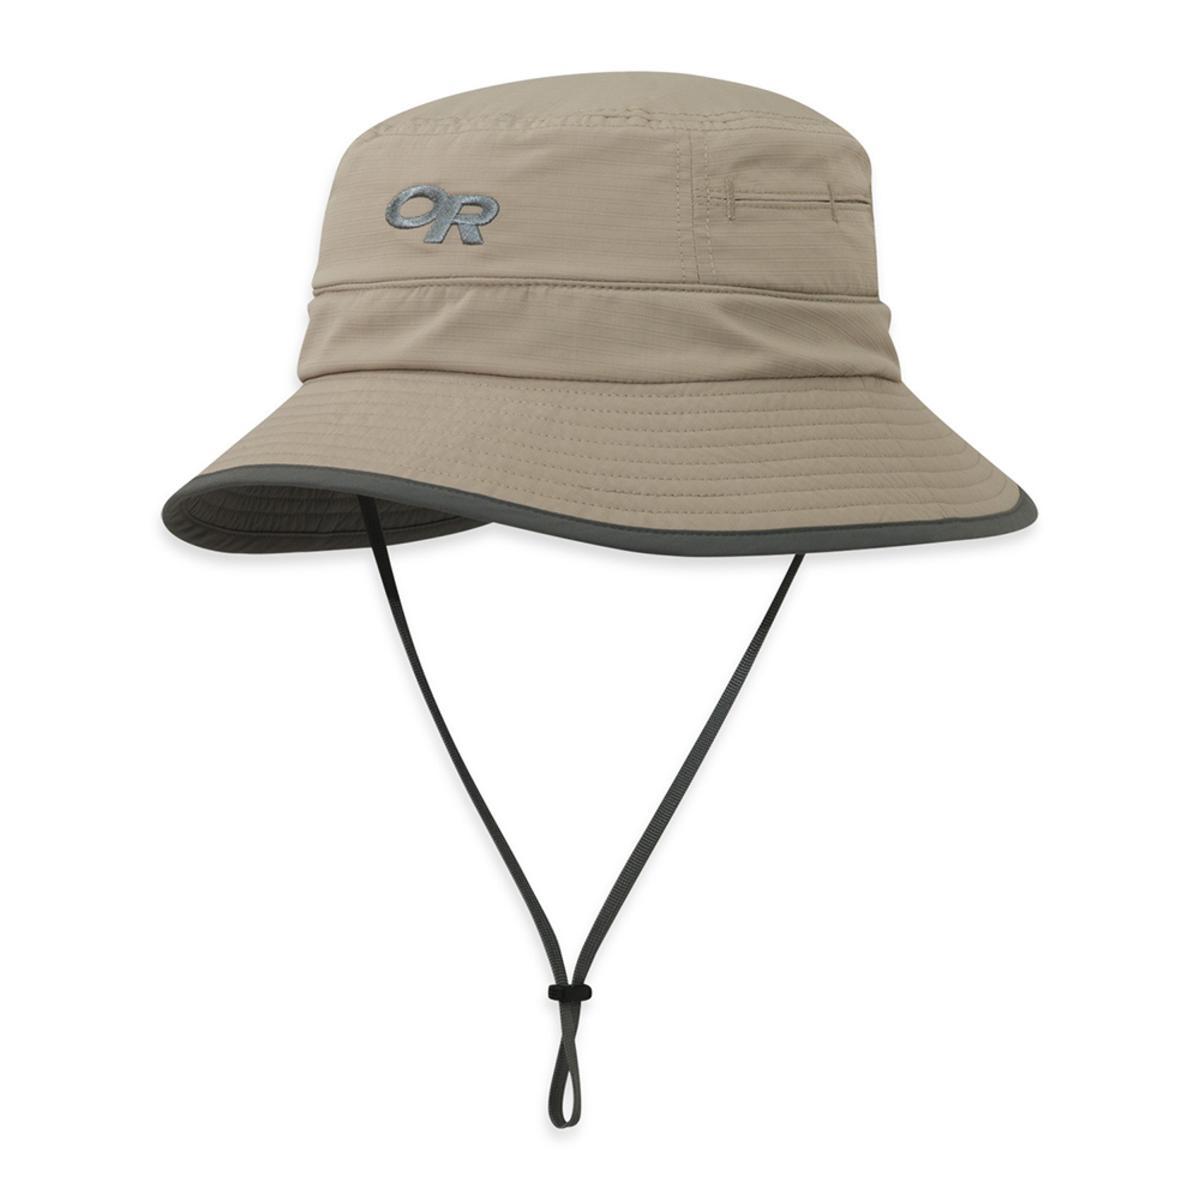 feb63e72b9700 Outdoor Research Sombriolet Sun Bucket Hat